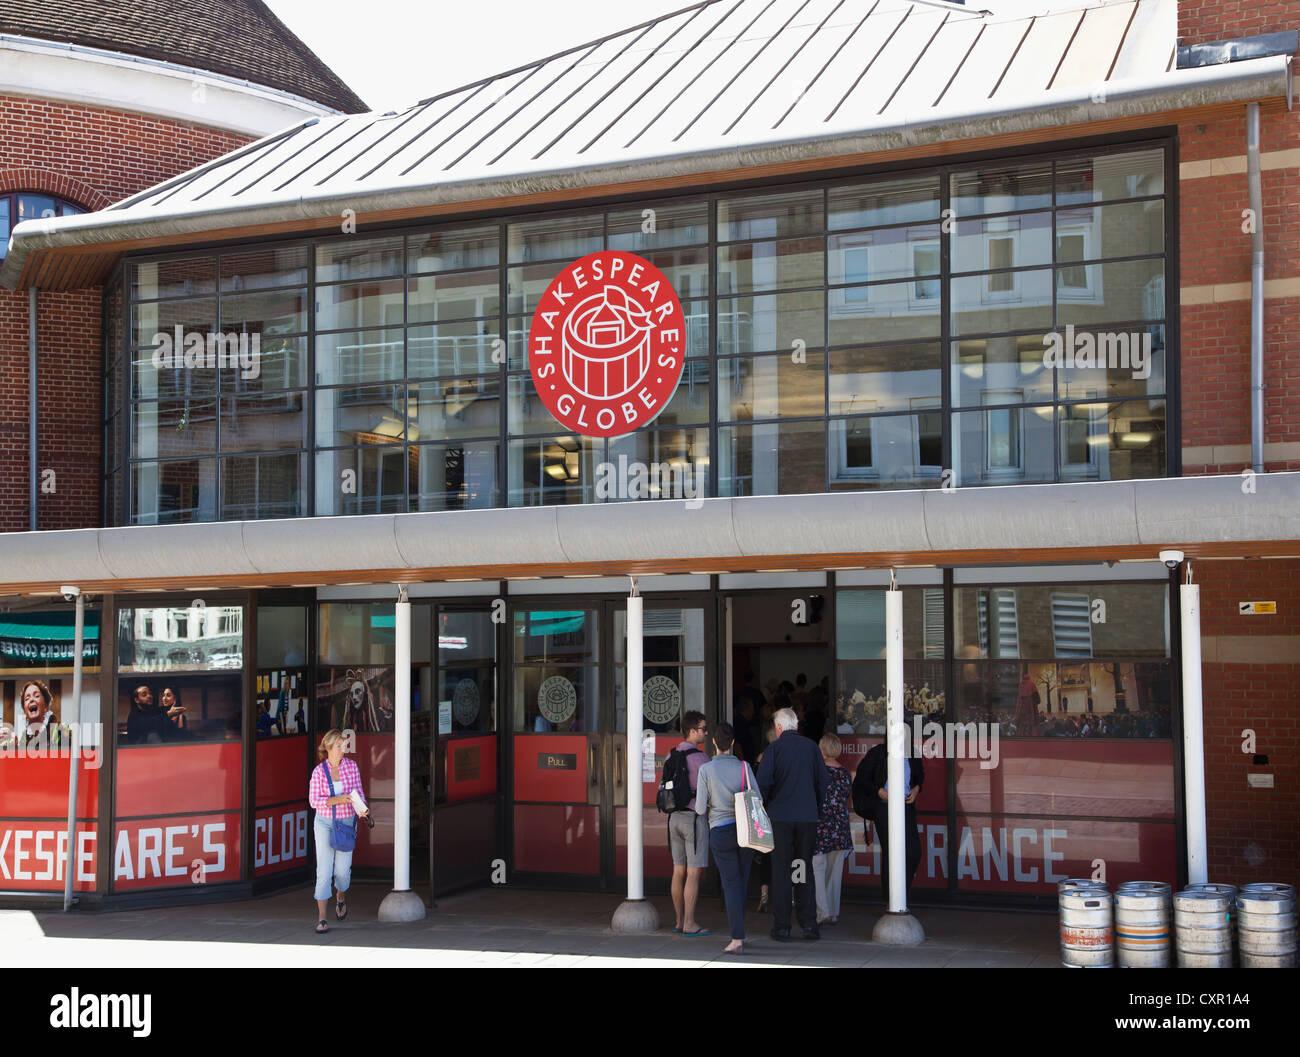 Shakespeare's Globe Theatre - Stock Image